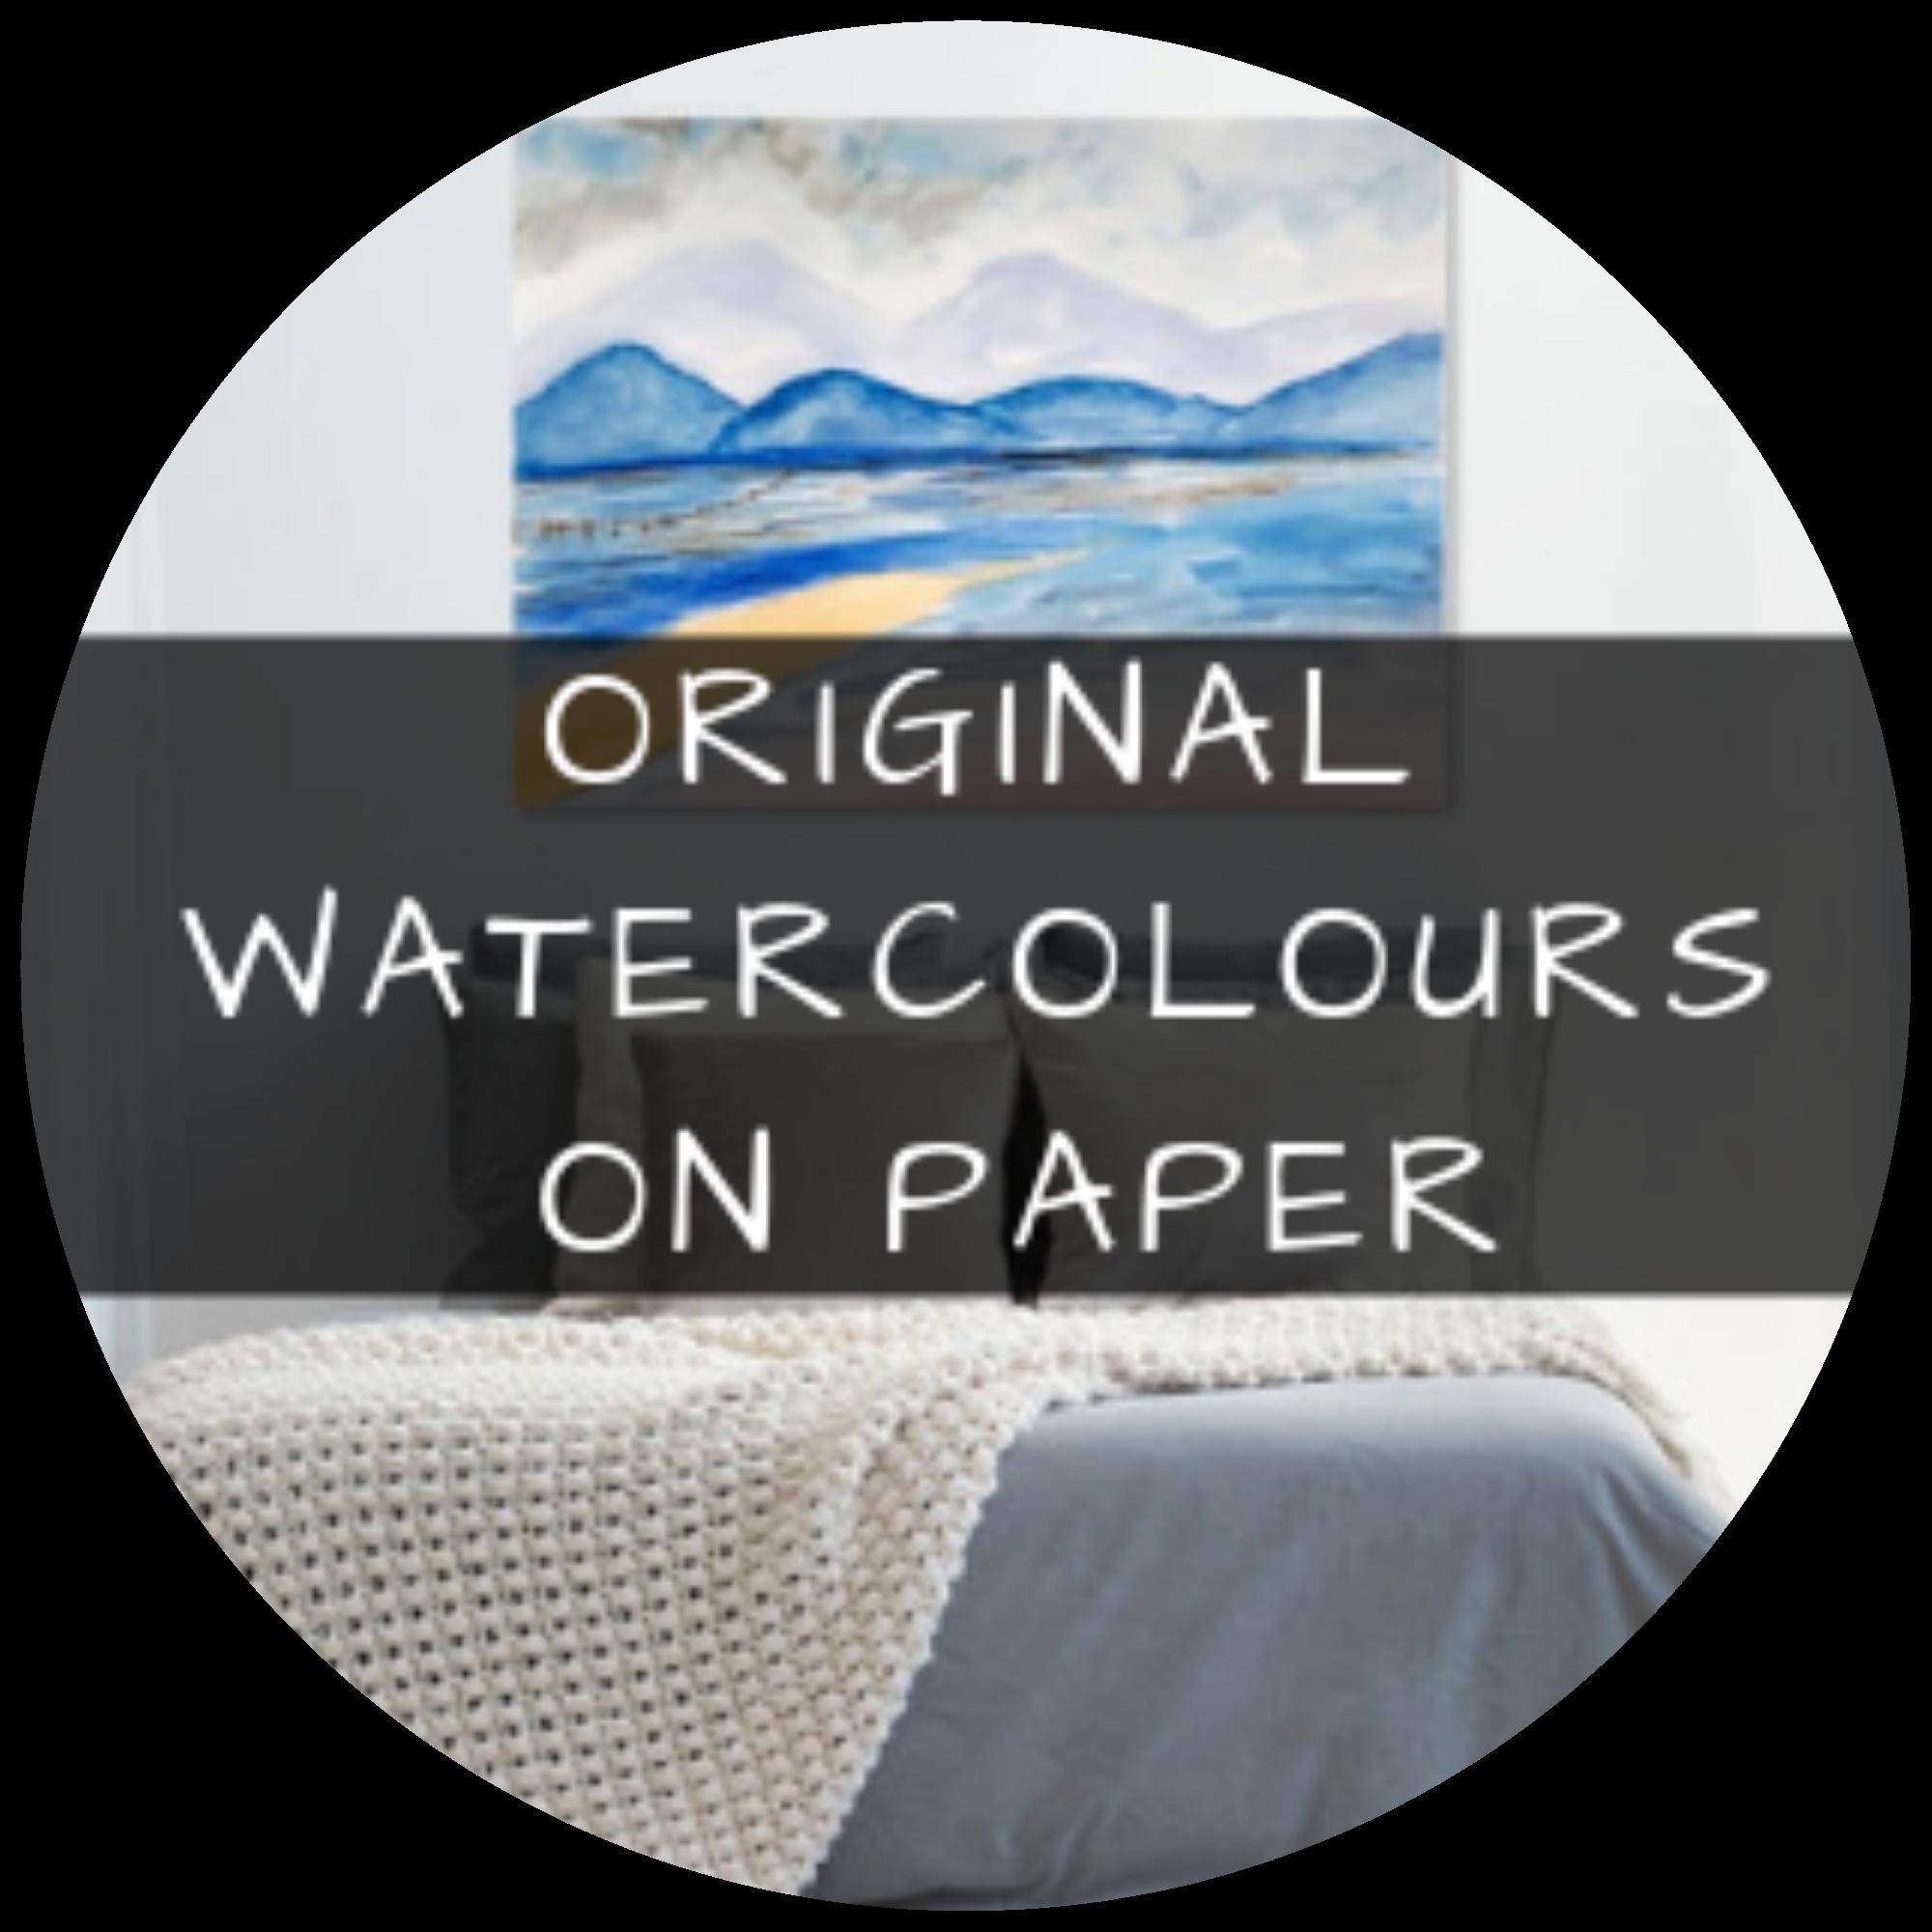 Original Watercolours on Paper